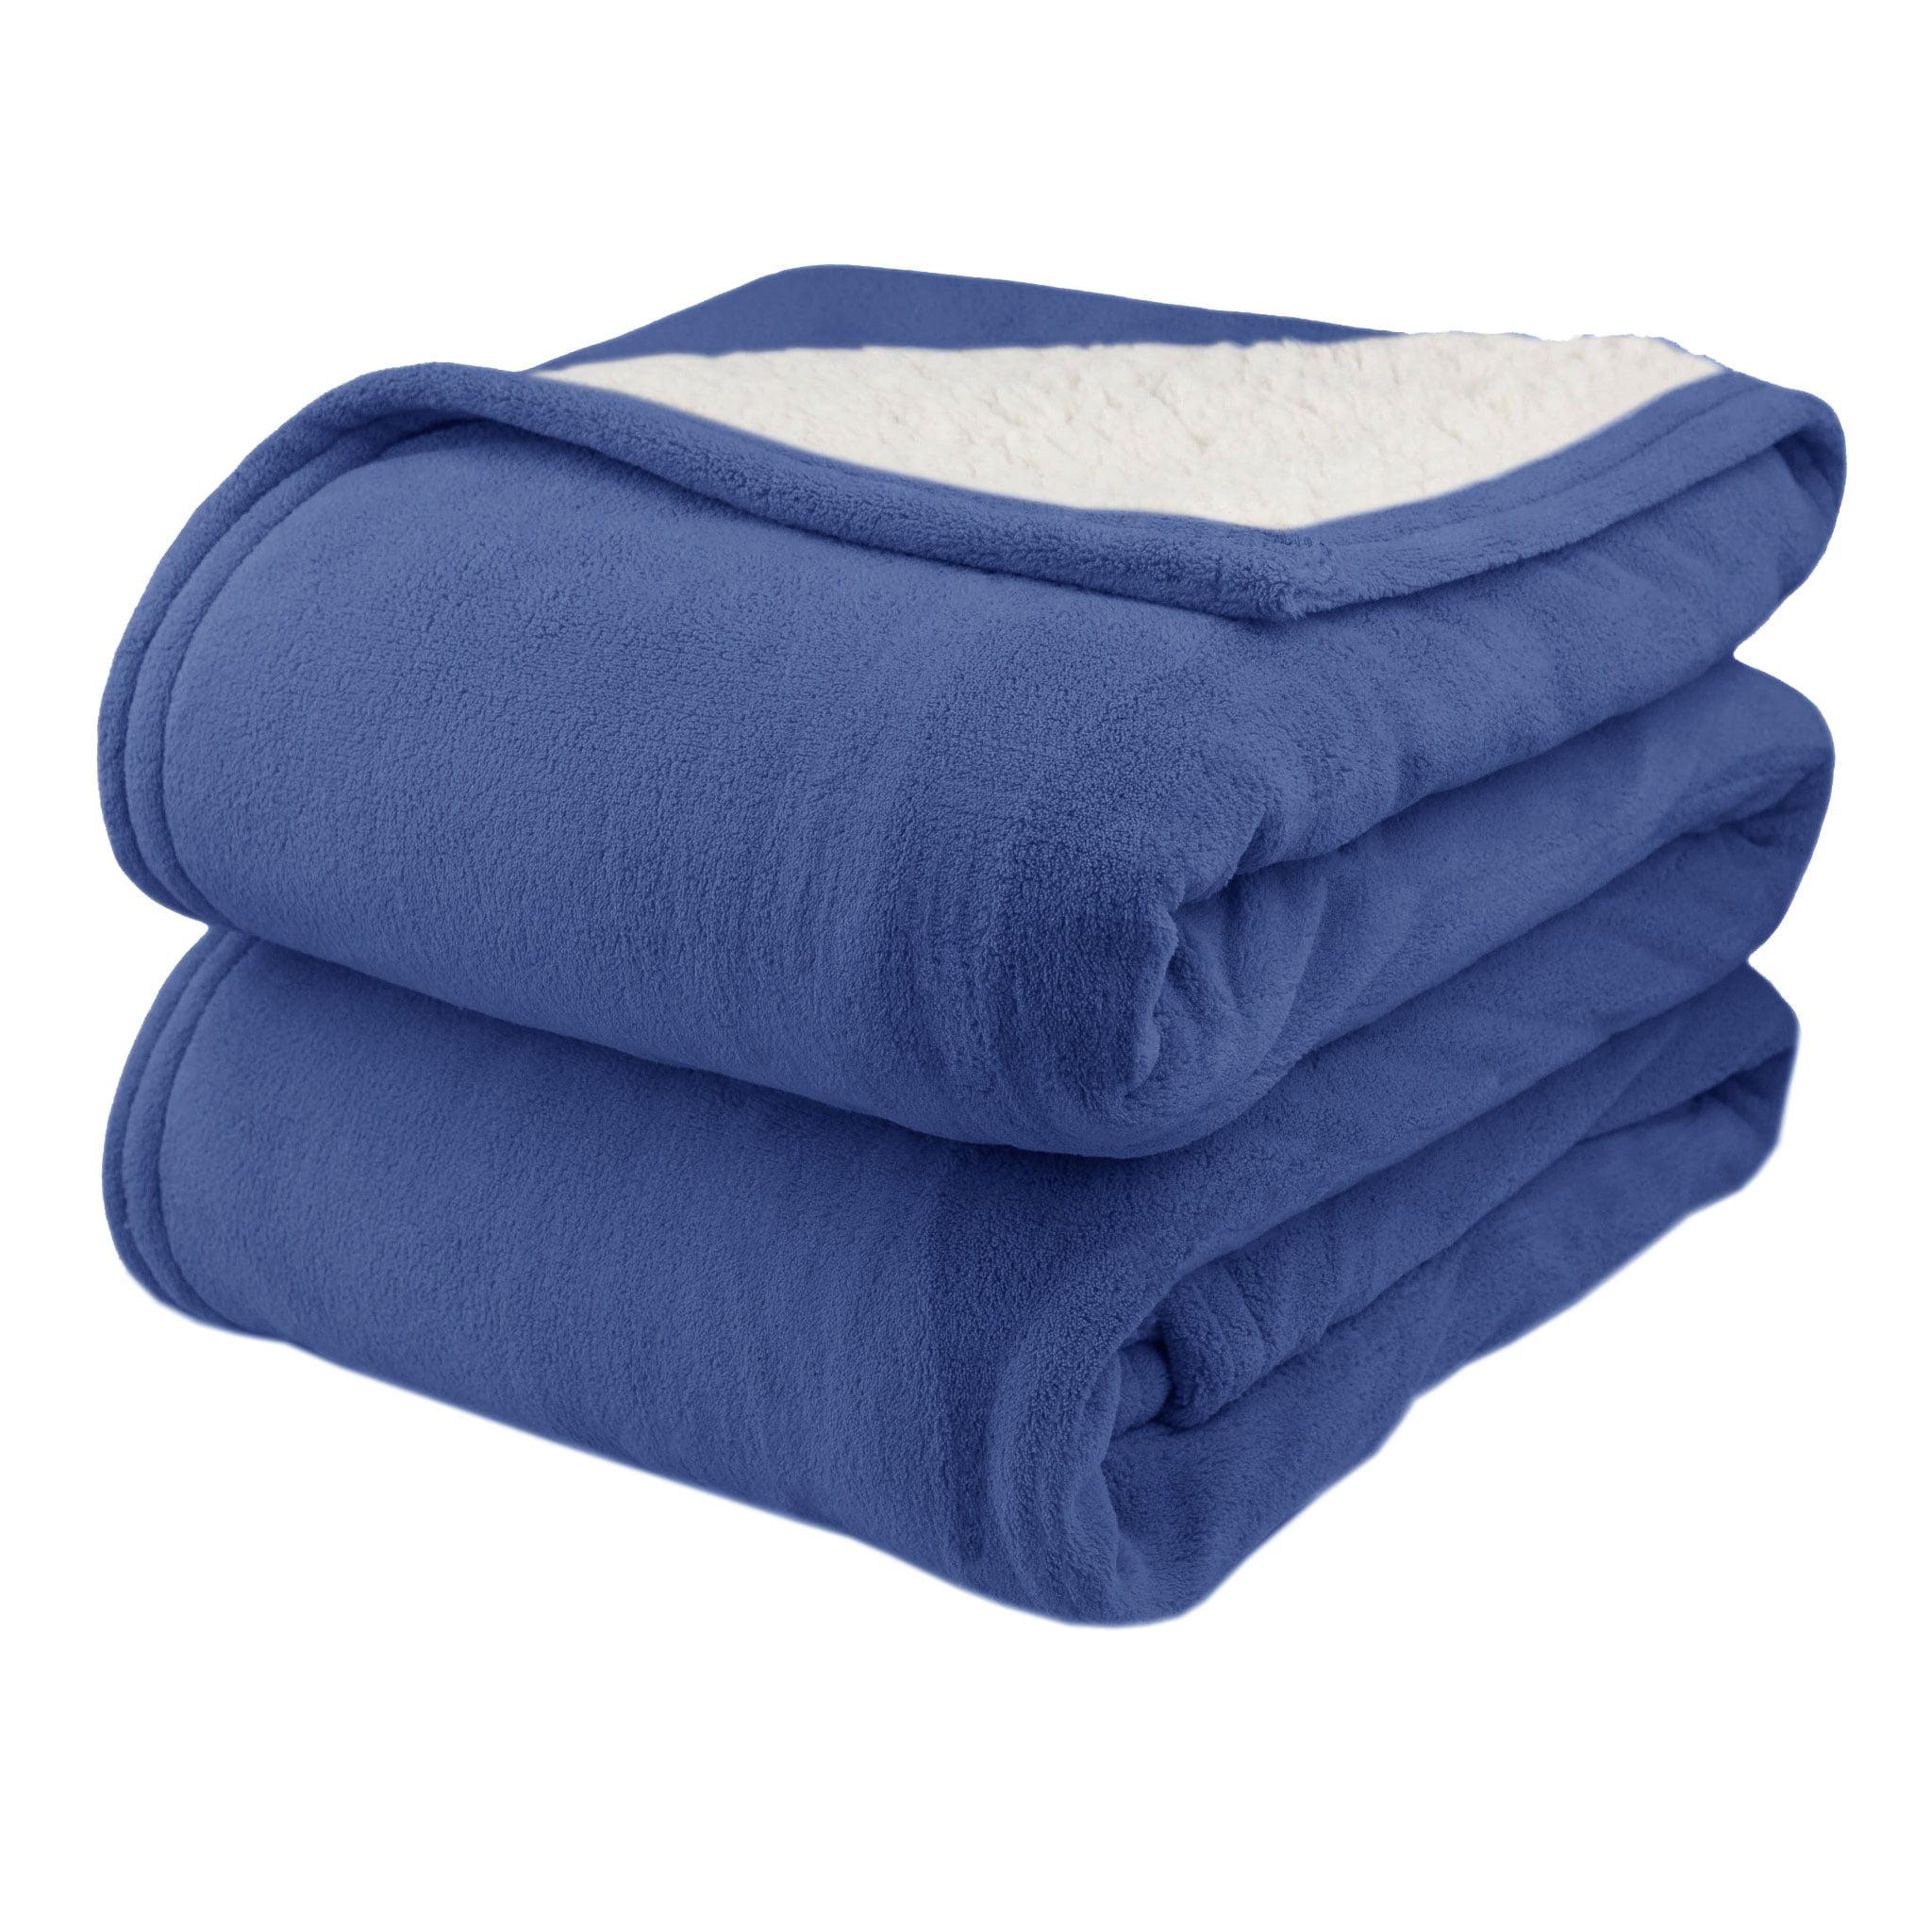 Pure Warmth MicroPlush Sherpa Electric Heated Warming Blanket